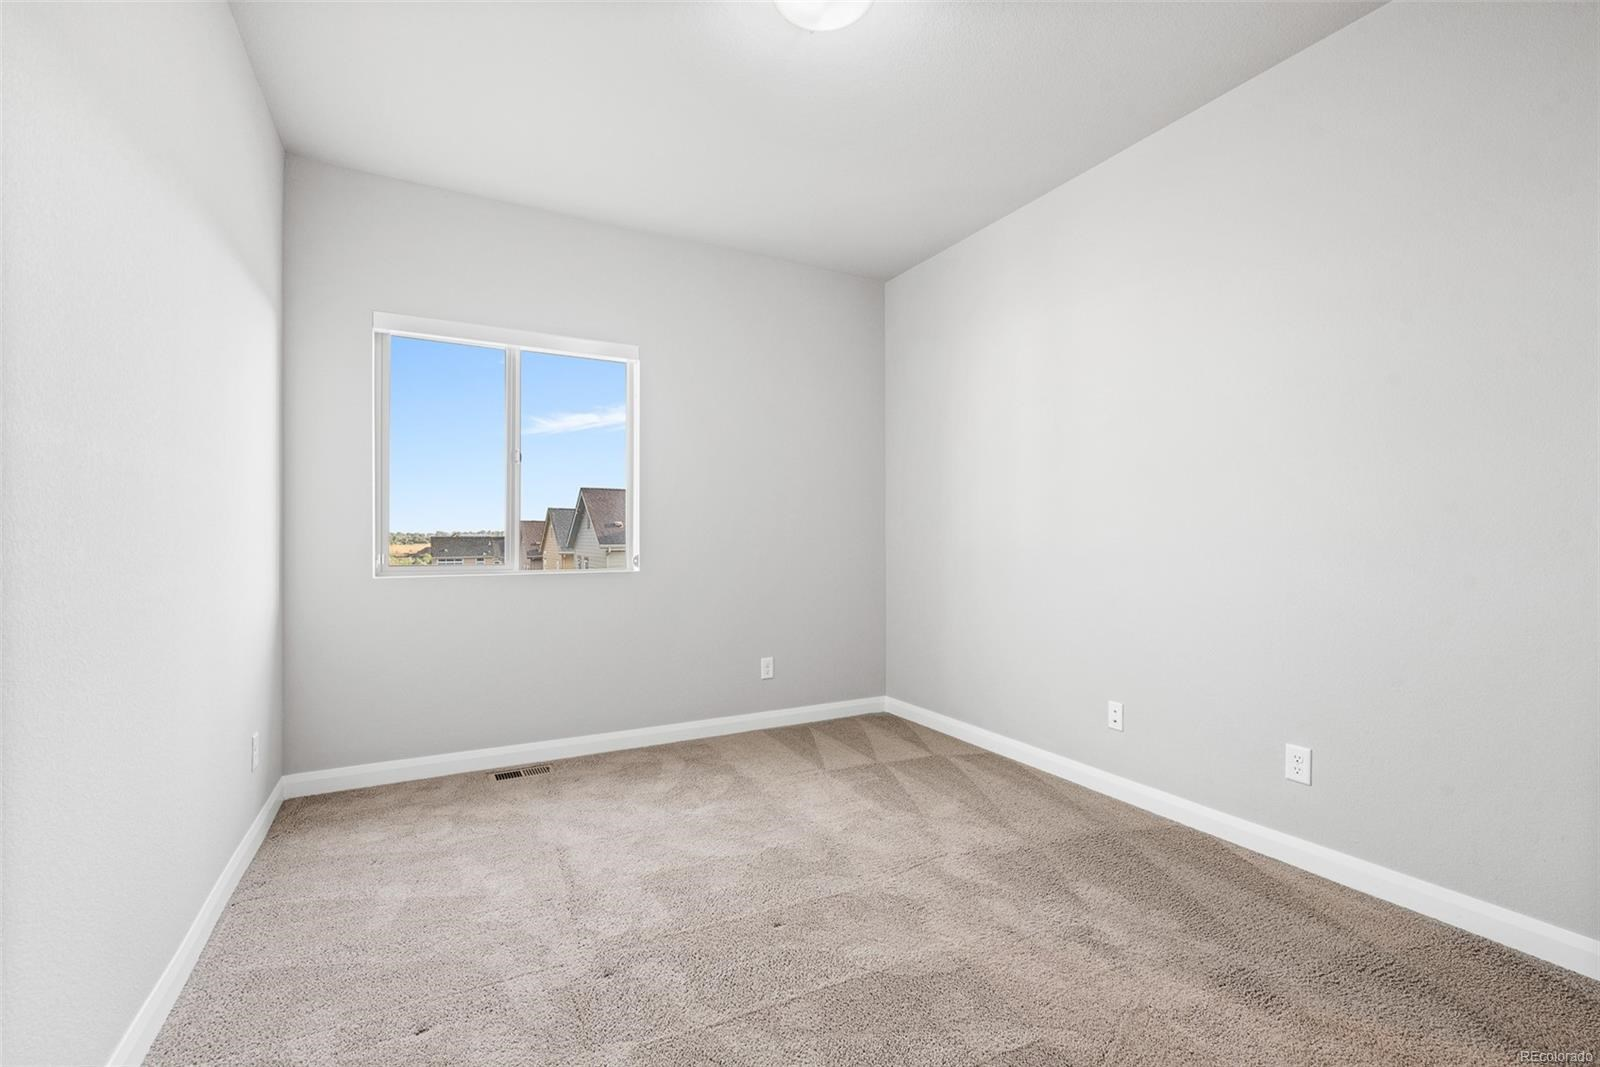 MLS# 5942880 - 1 - 1700  W 67th Avenue, Denver, CO 80221